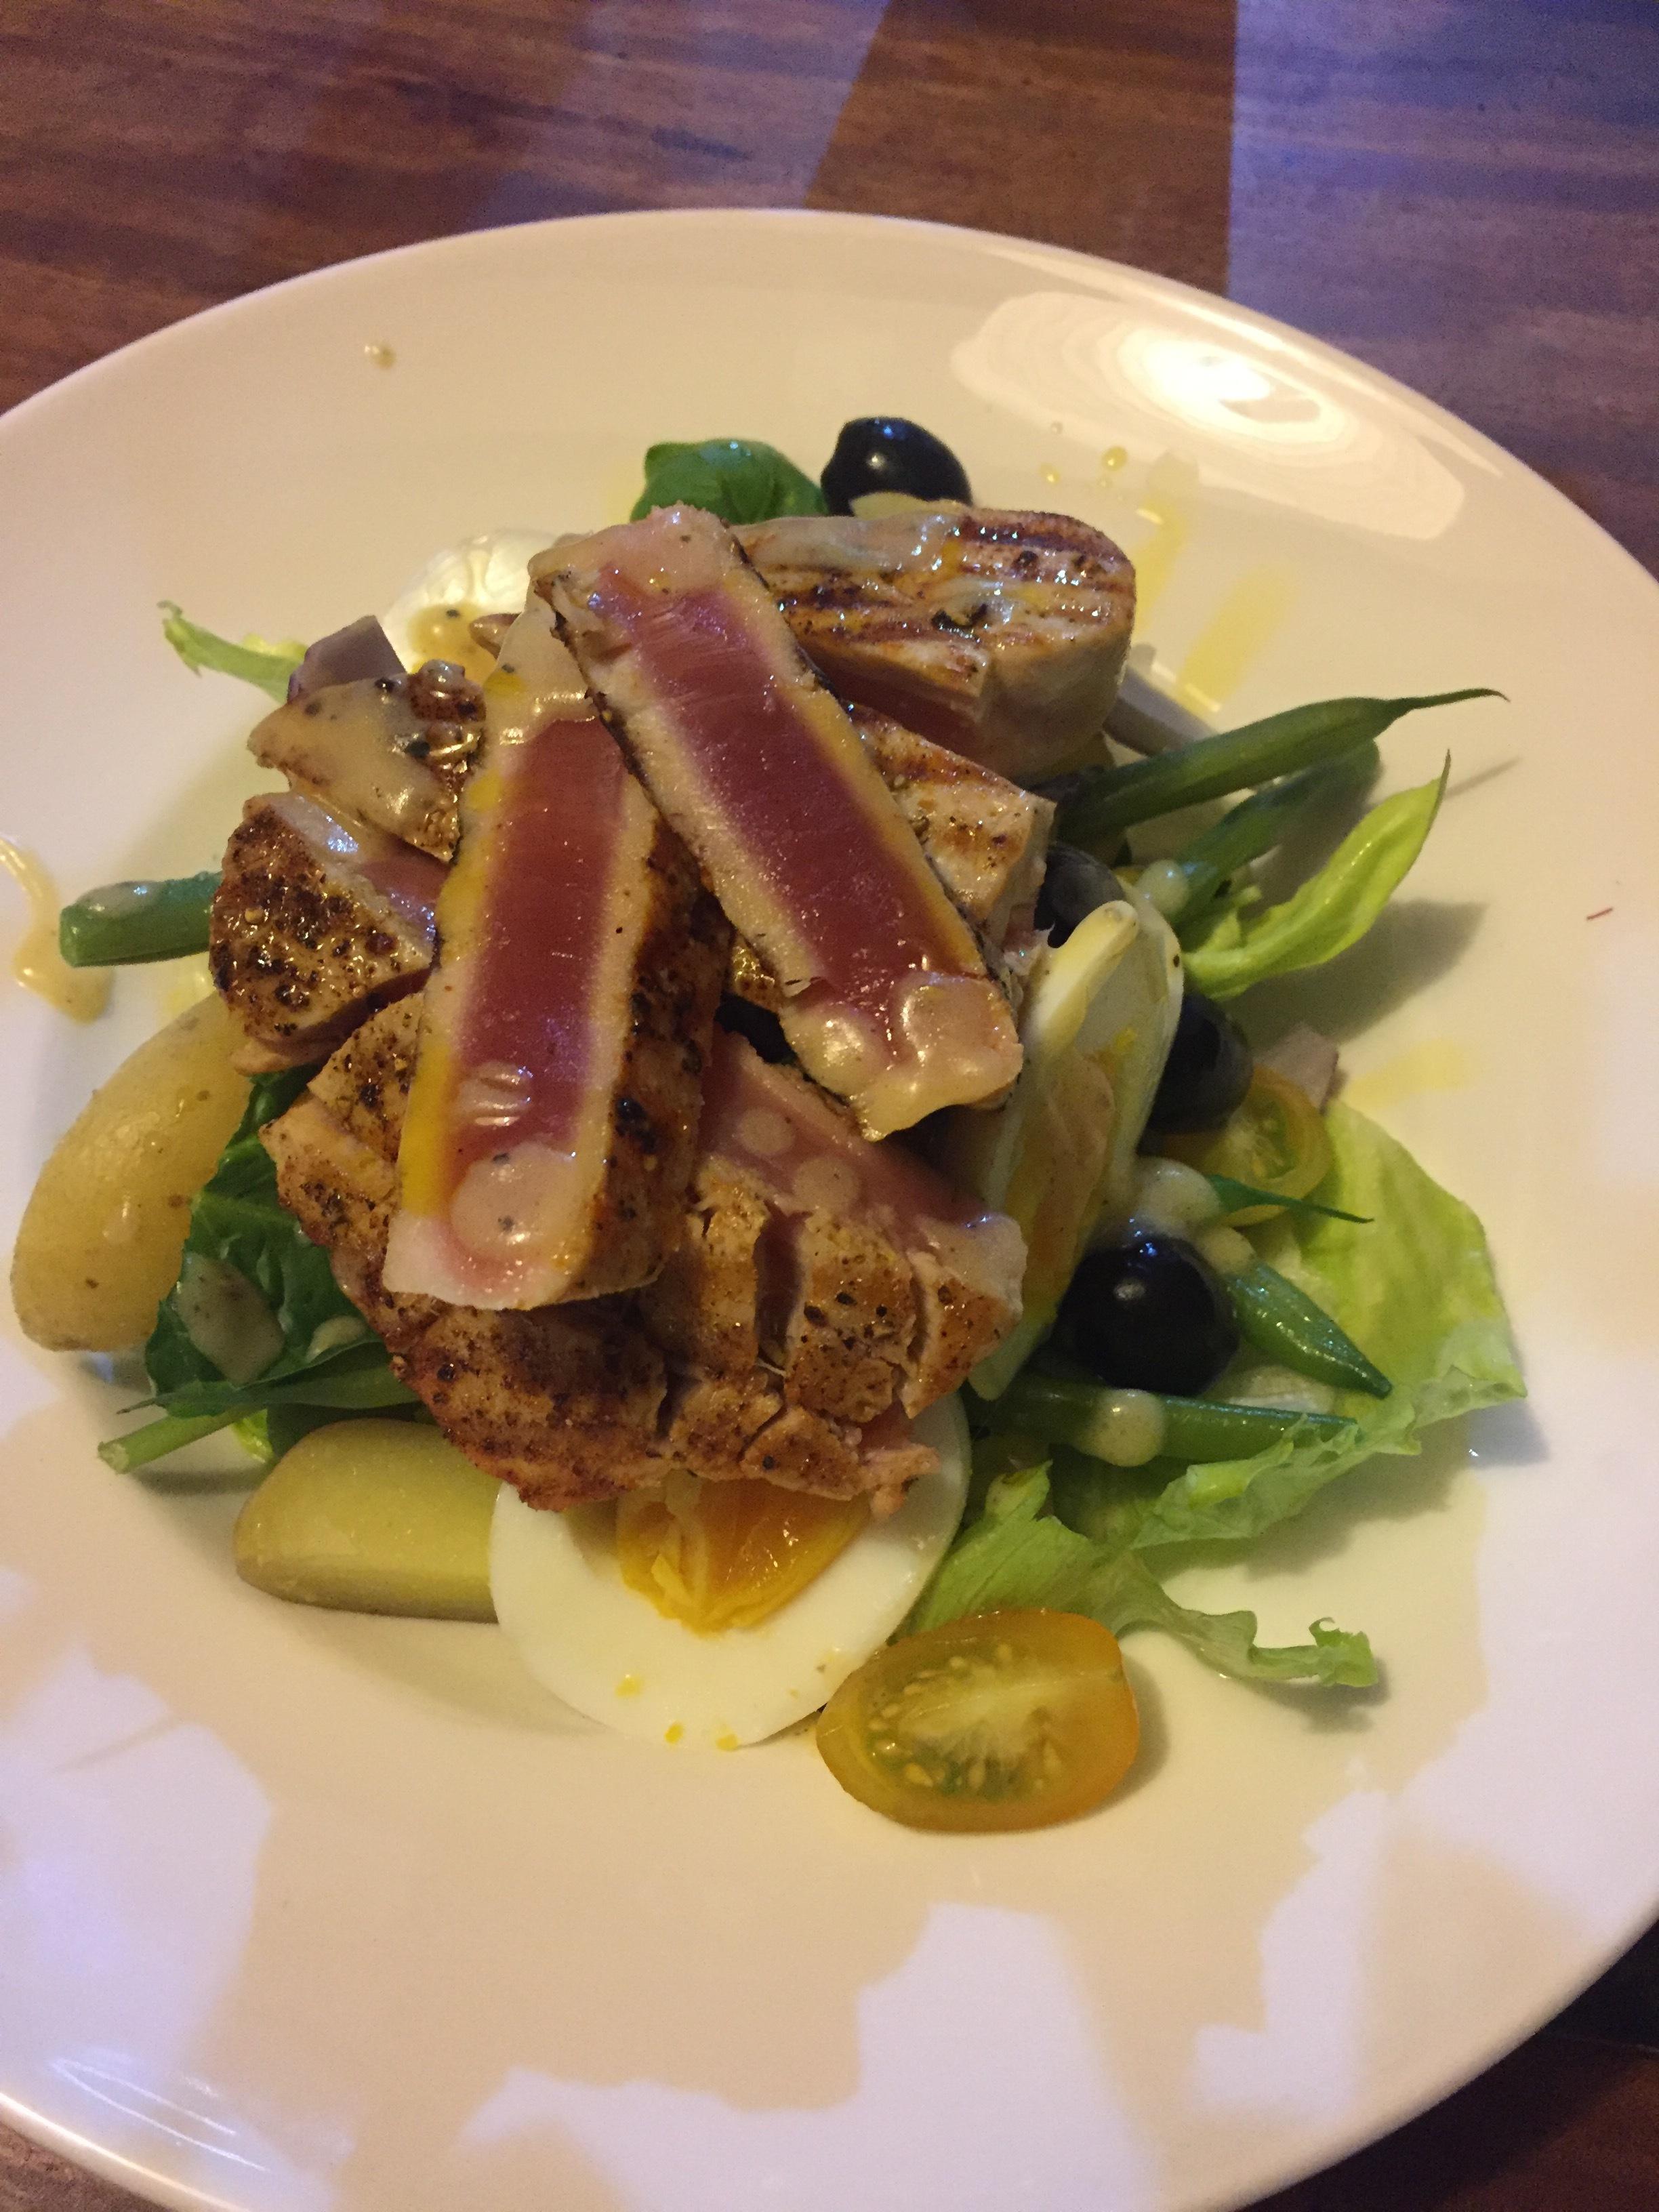 Tuna loin Niçoise salad